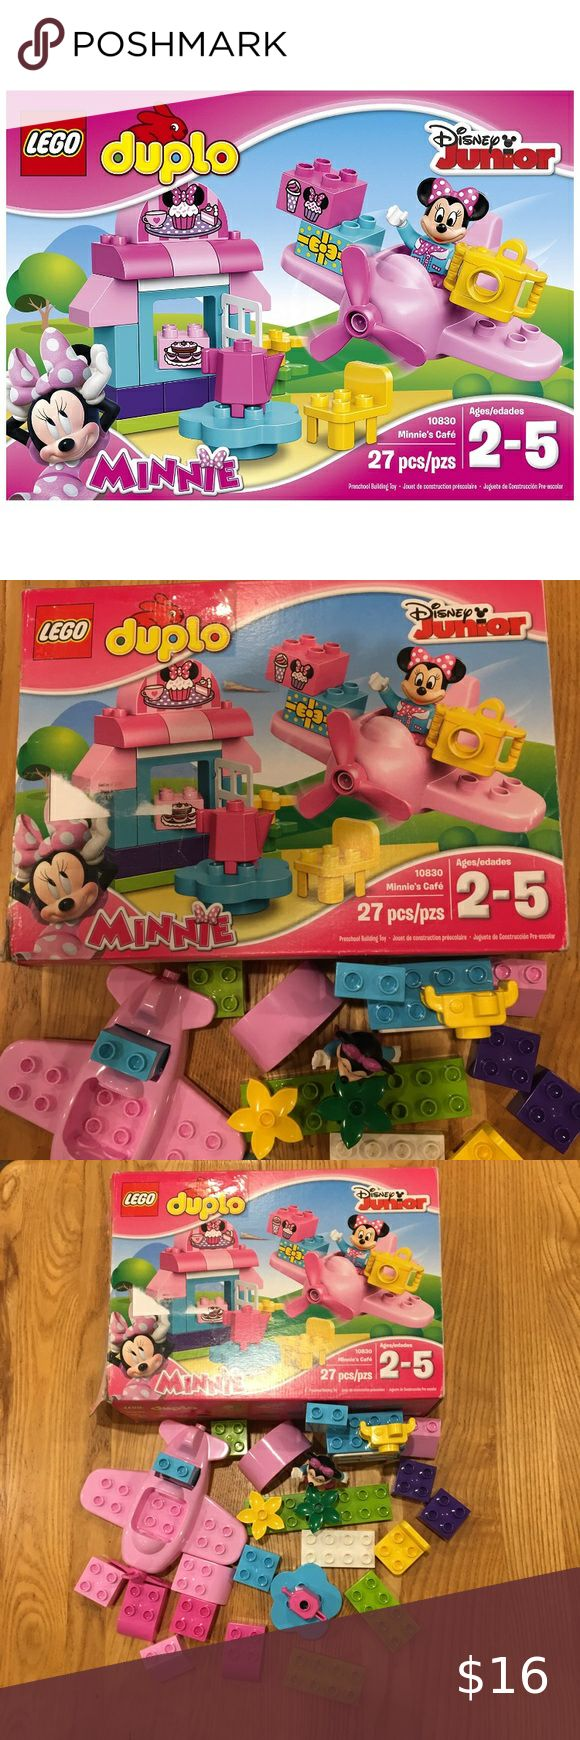 Lego Duplo Disney Junior Minnie Mouse Airplane Set in 2020 ...